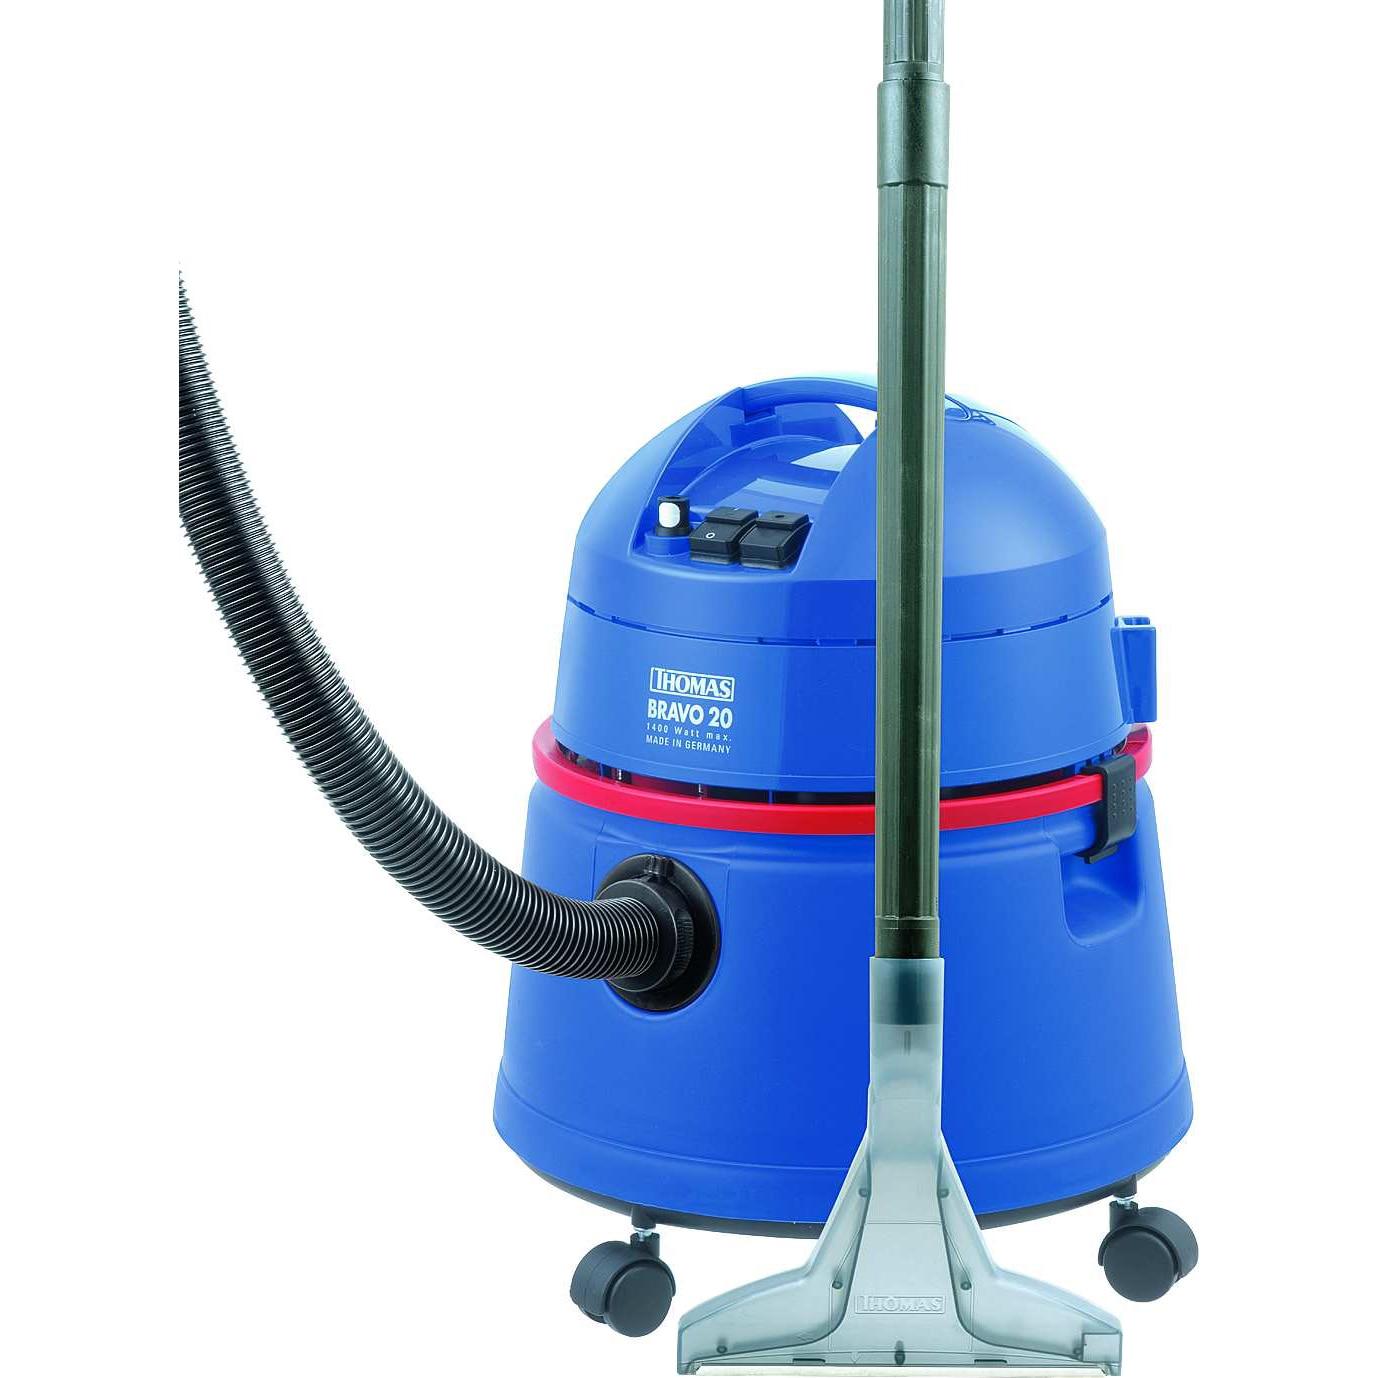 Fotografie Aspirator fara sac Thomas Bravo 20 788074, 1400 W, sistem special cu presiune de pulverizare, Albastru